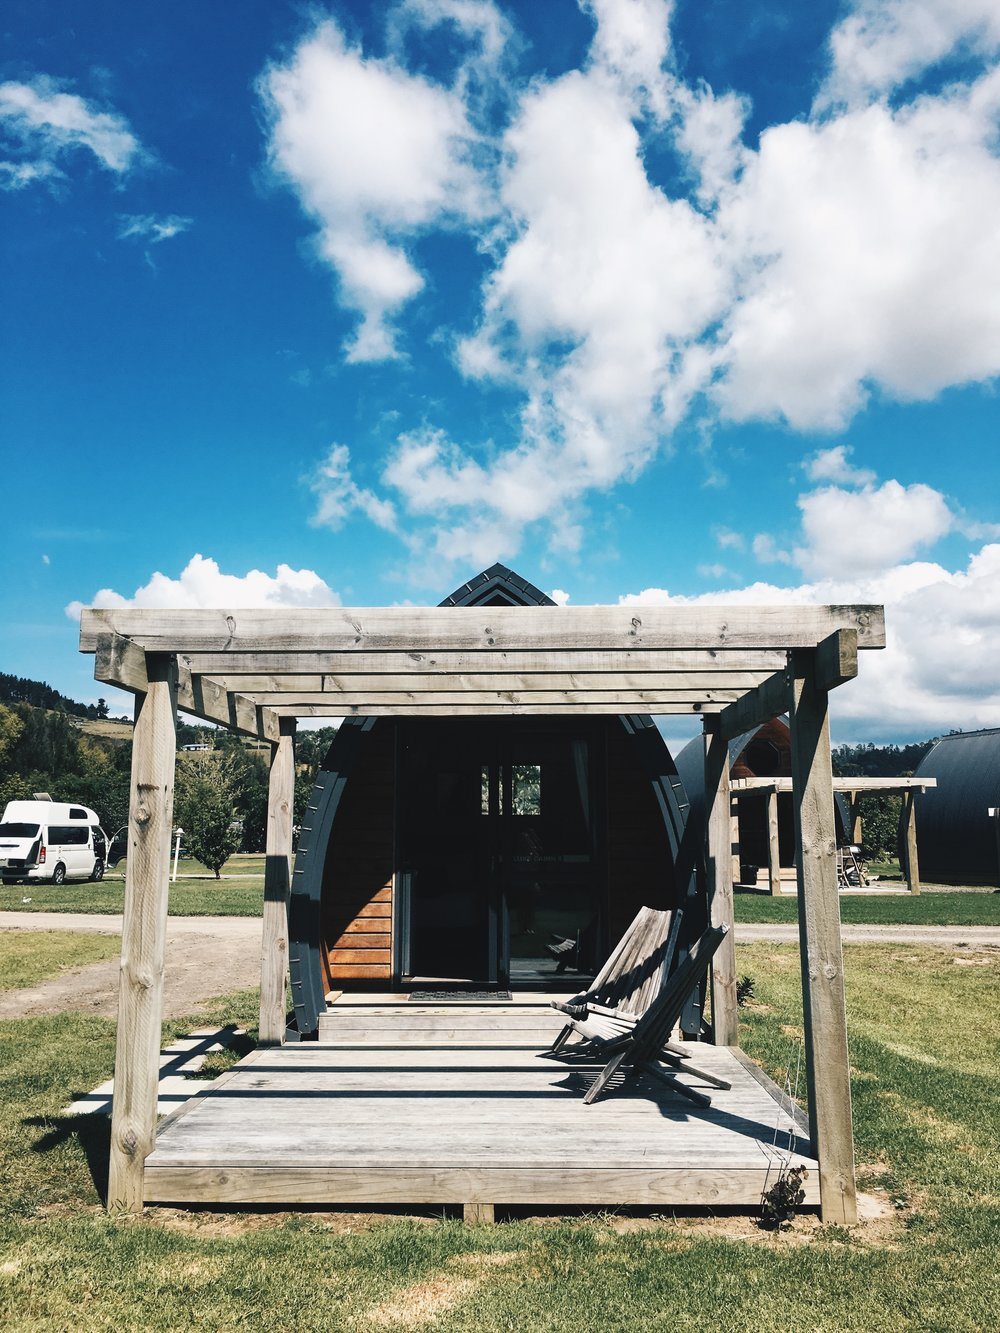 hotwaterbeach-newzealand-northisland-travelguide-gretacaptures-kiwiexperience